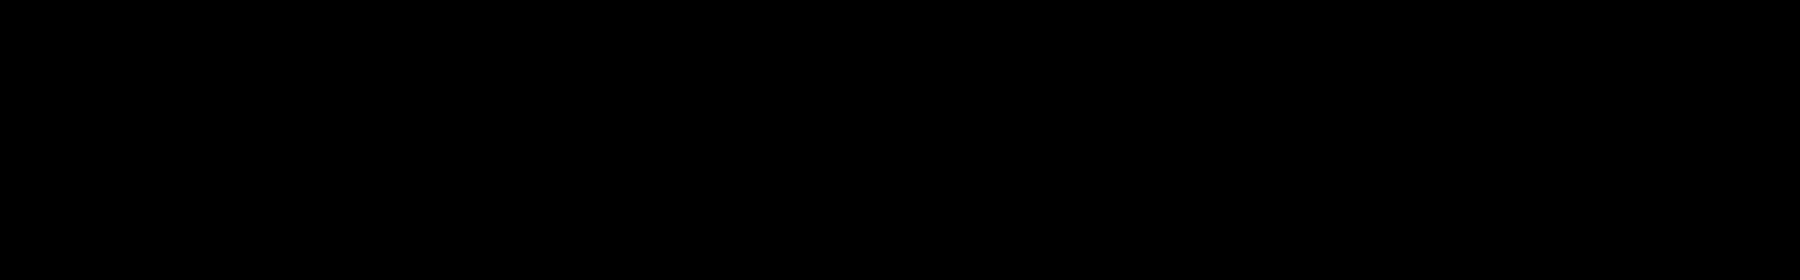 6GOD audio waveform